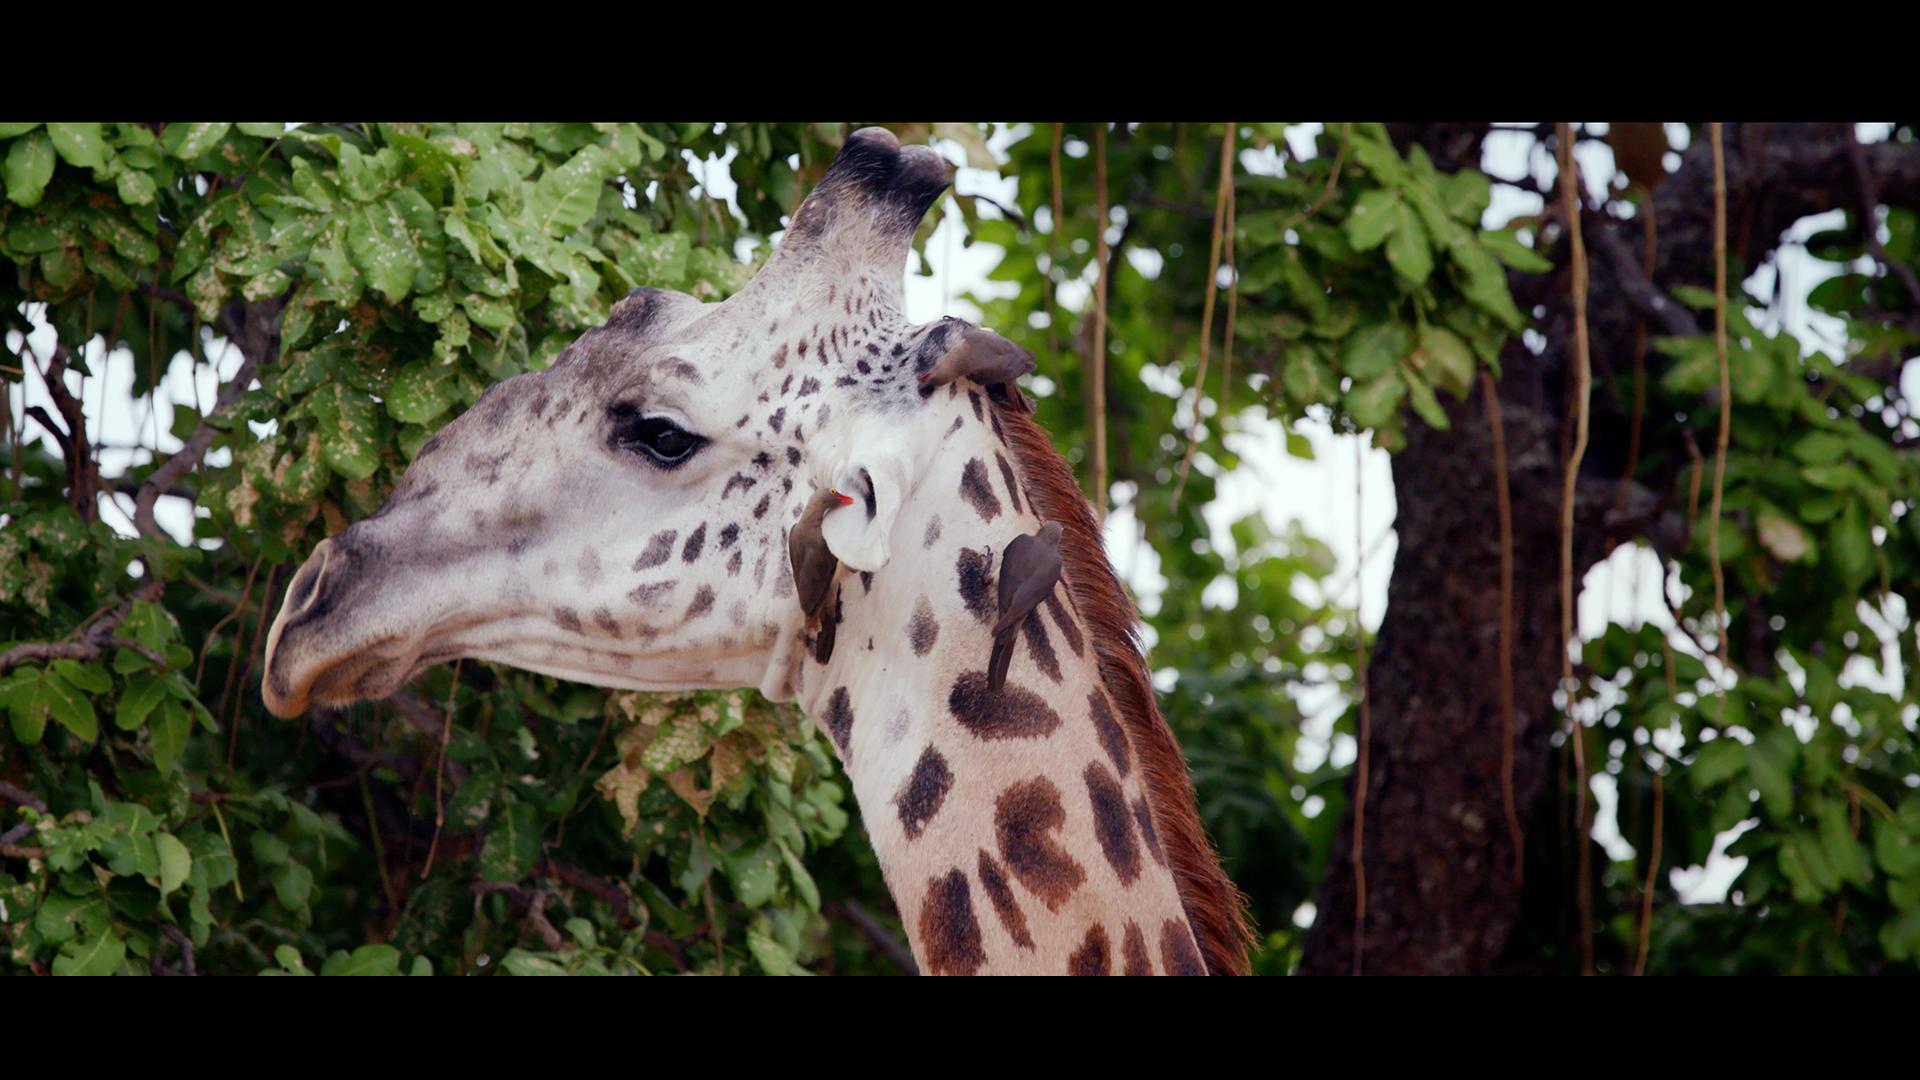 Giraffe 3 copy.png